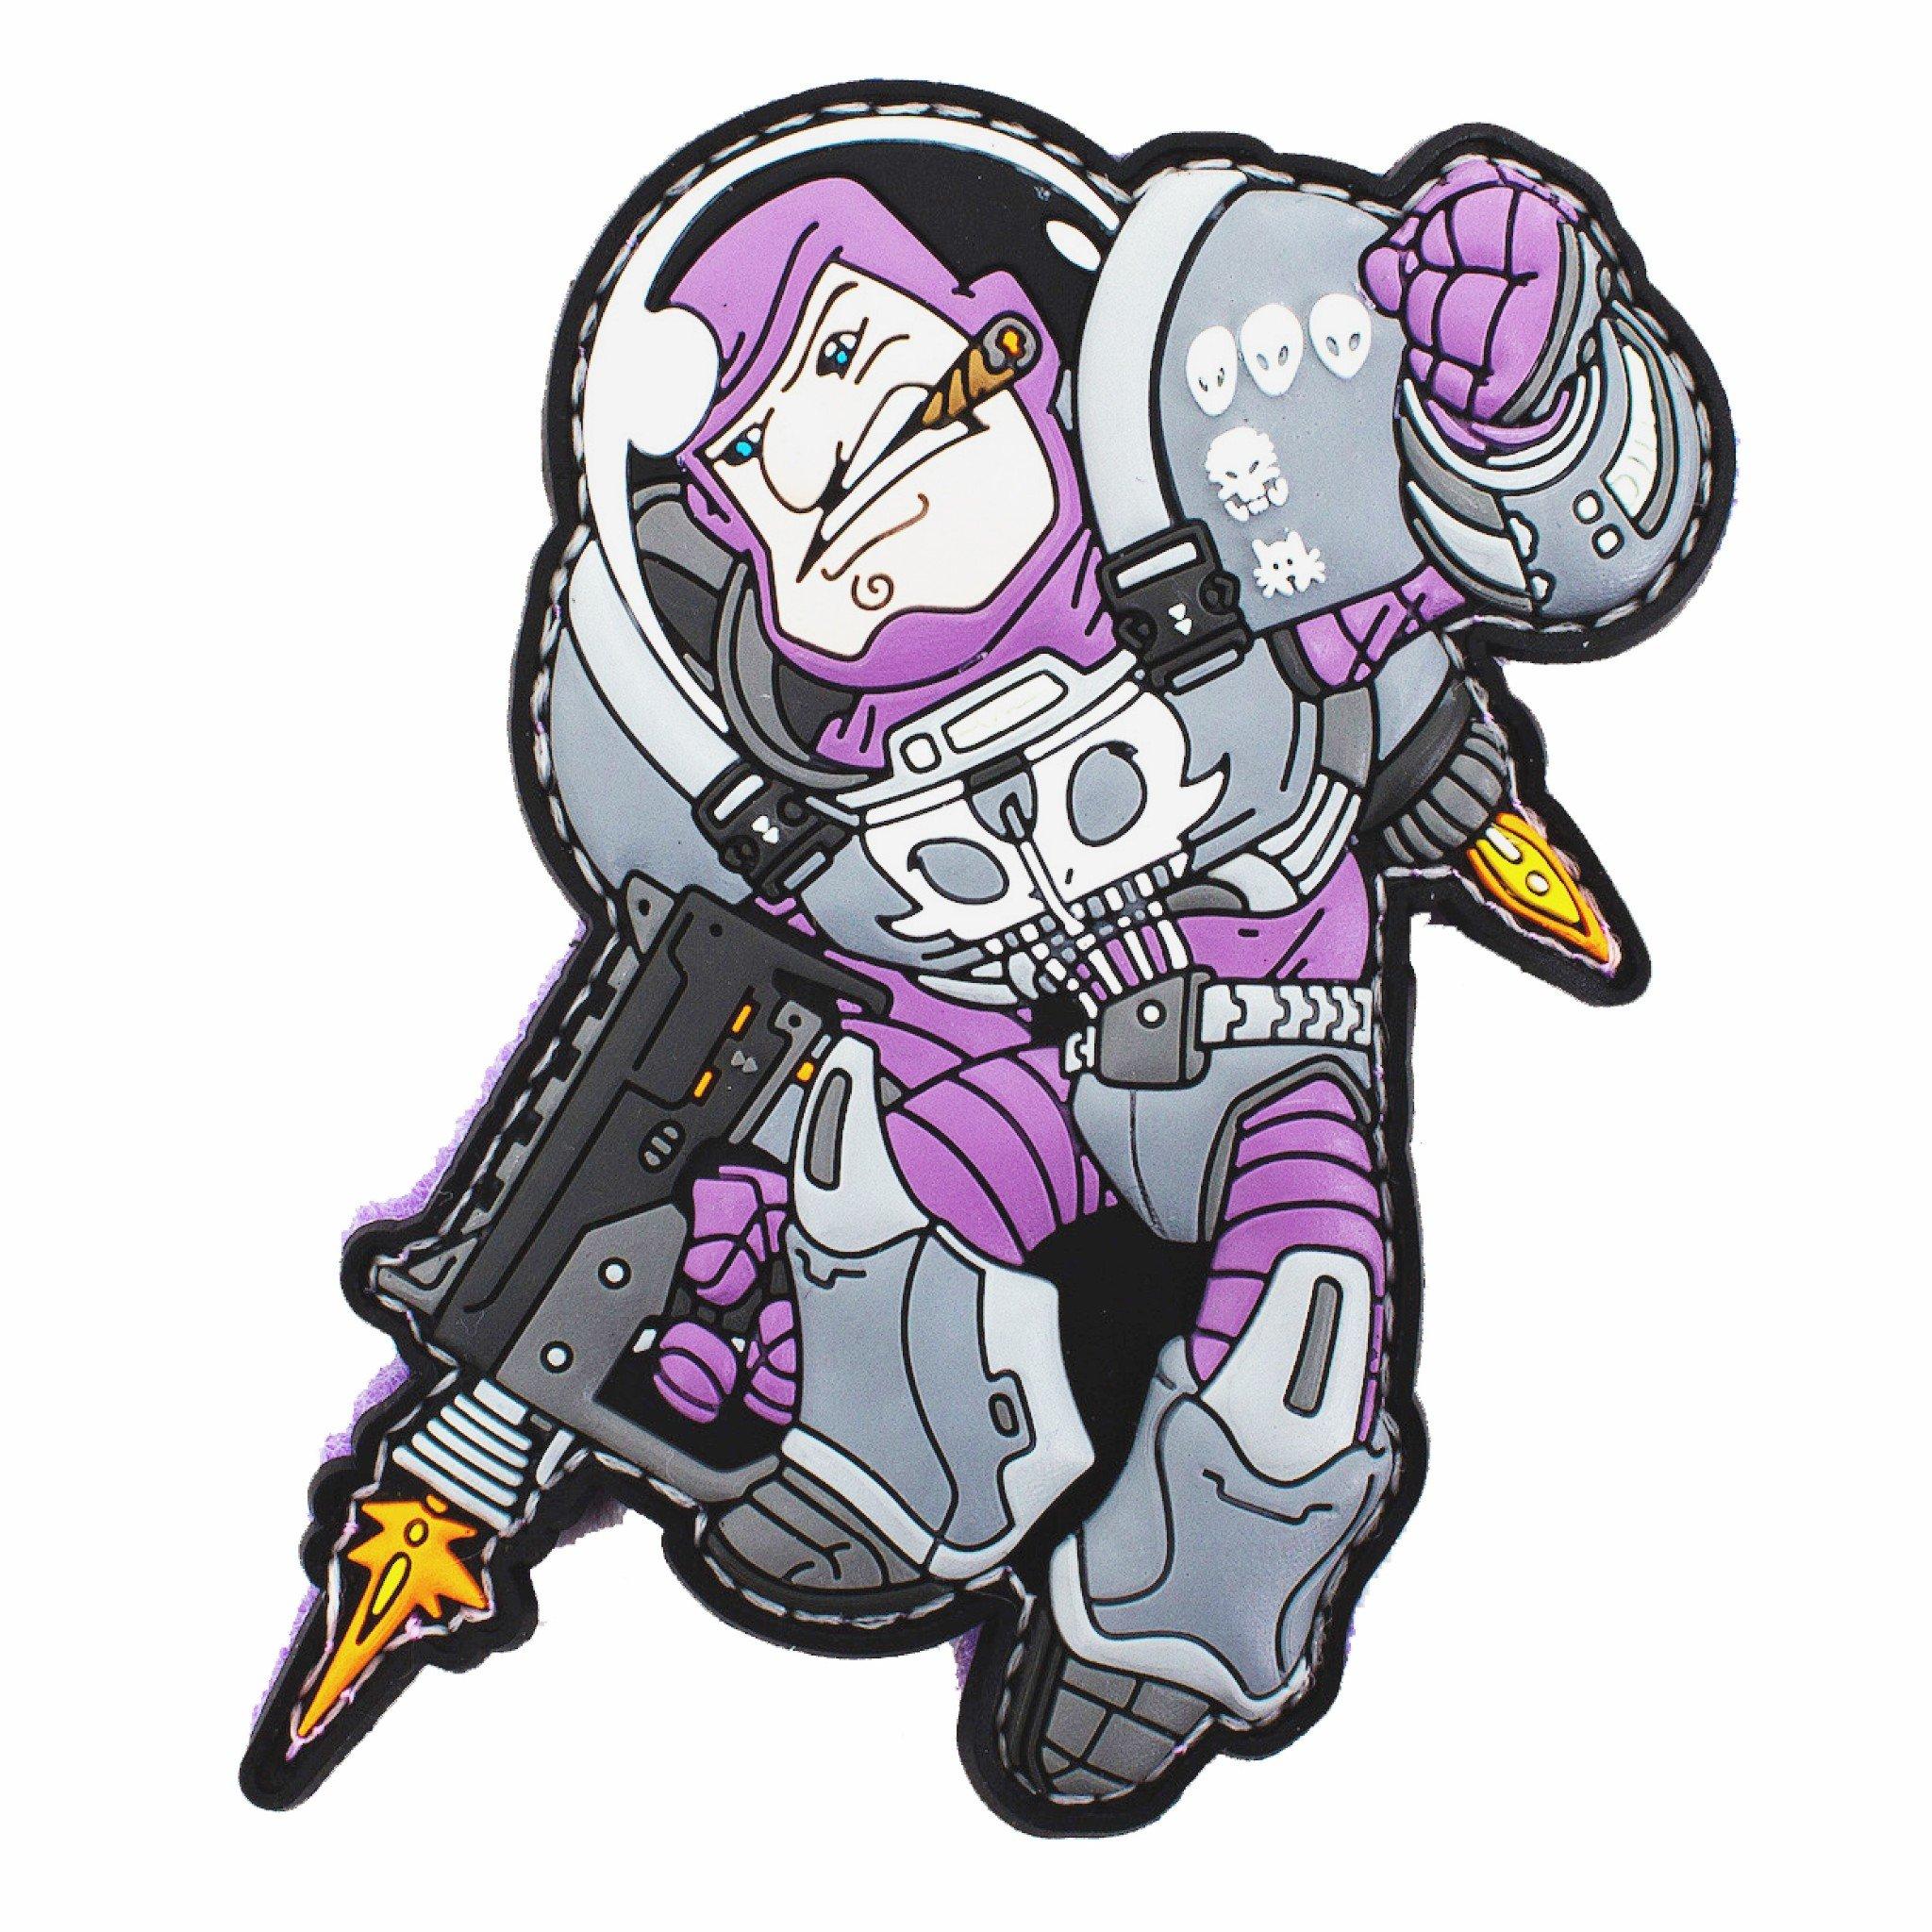 Space Force Marine Vs Alien Patch